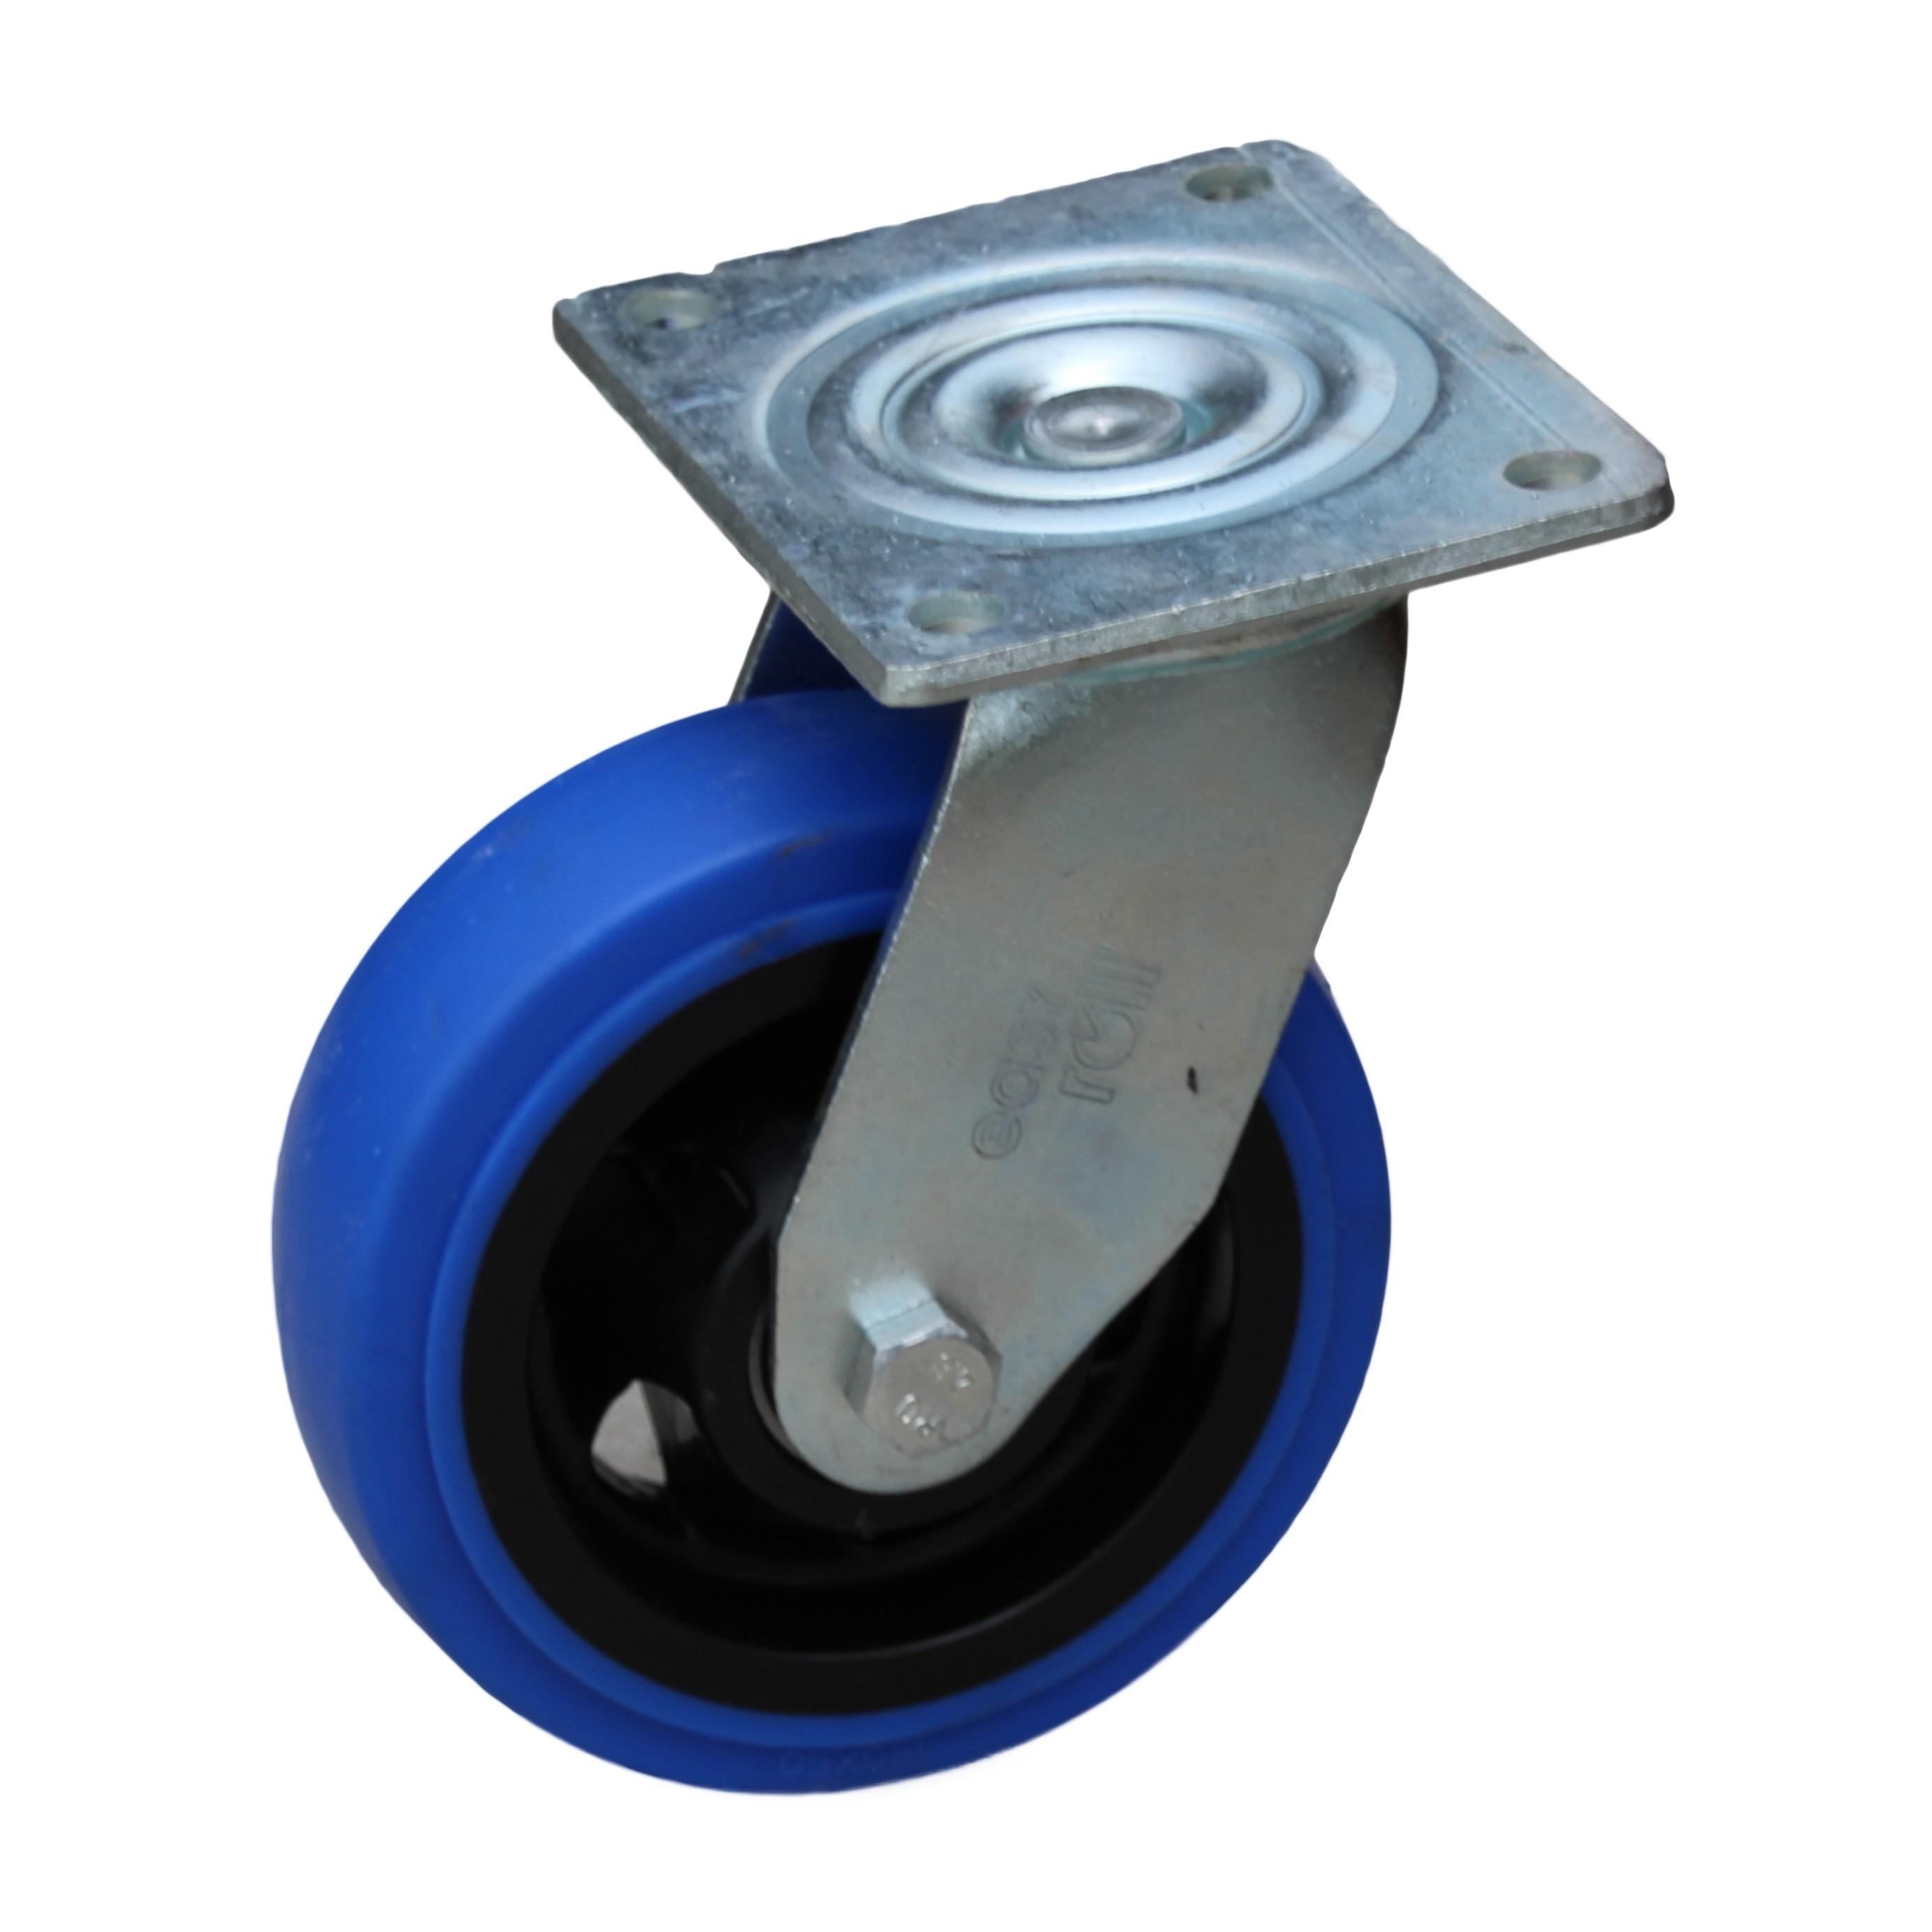 150mm blue rubber swivel castor trolley castors wheels for Castor services